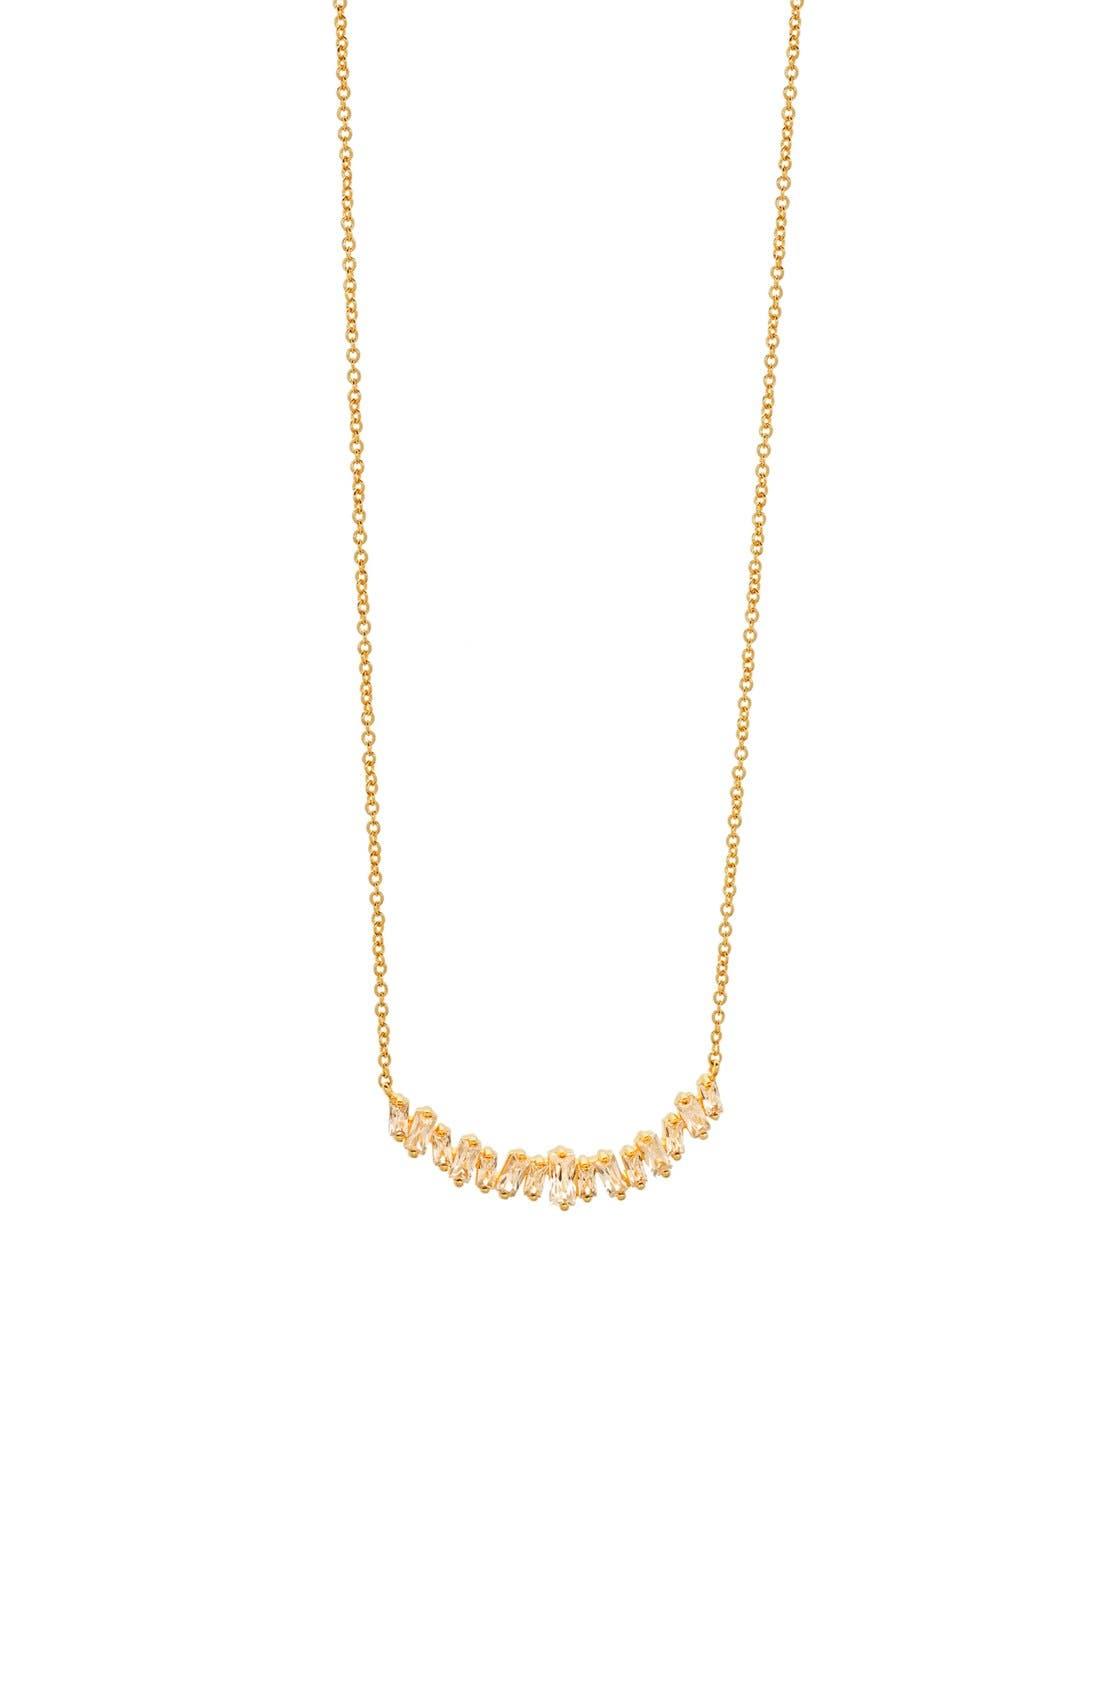 Amara Collar Necklace,                         Main,                         color, Gold